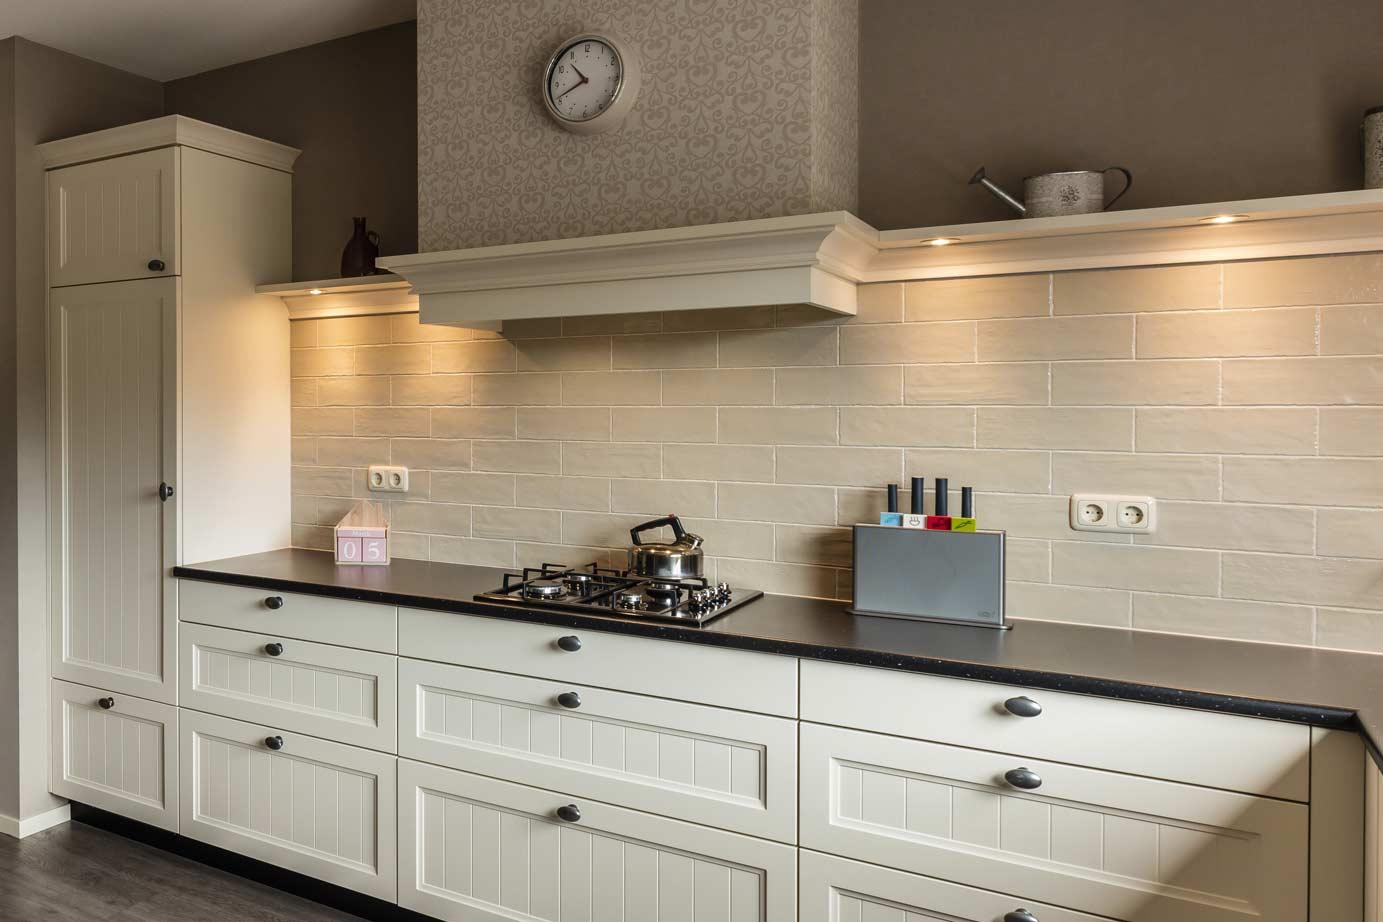 keuken tegels schilderen : Achterwand Keuken Gamma Beautiful Zwart Tegels Keuken Keuken